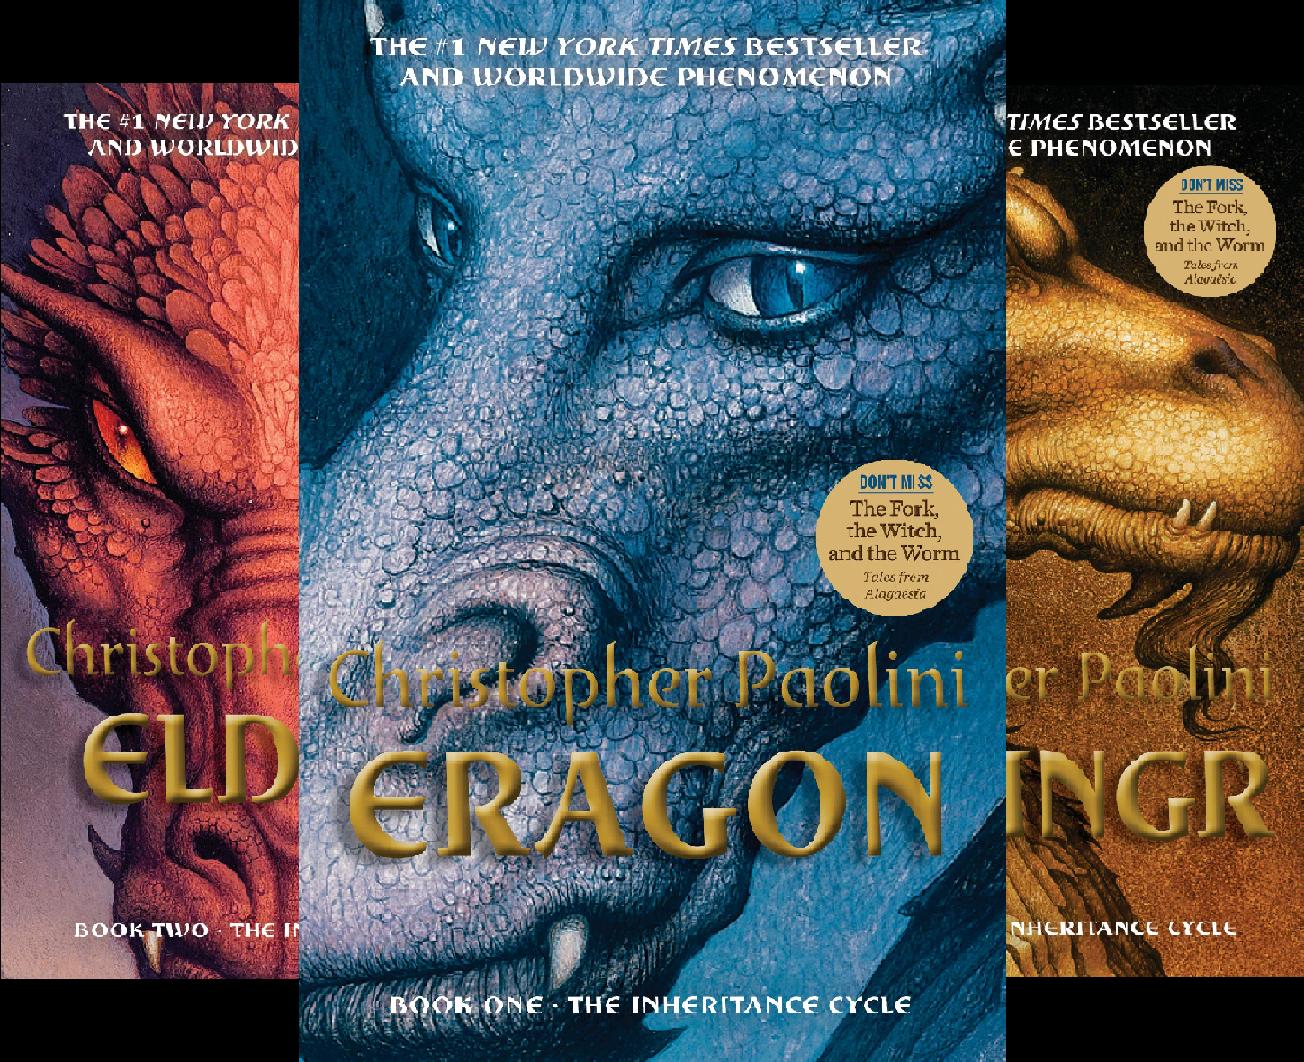 Inheritance 3-Book Hardcover Boxed Set (Eragon, Eldest, Brisingr) (3 Book Series)